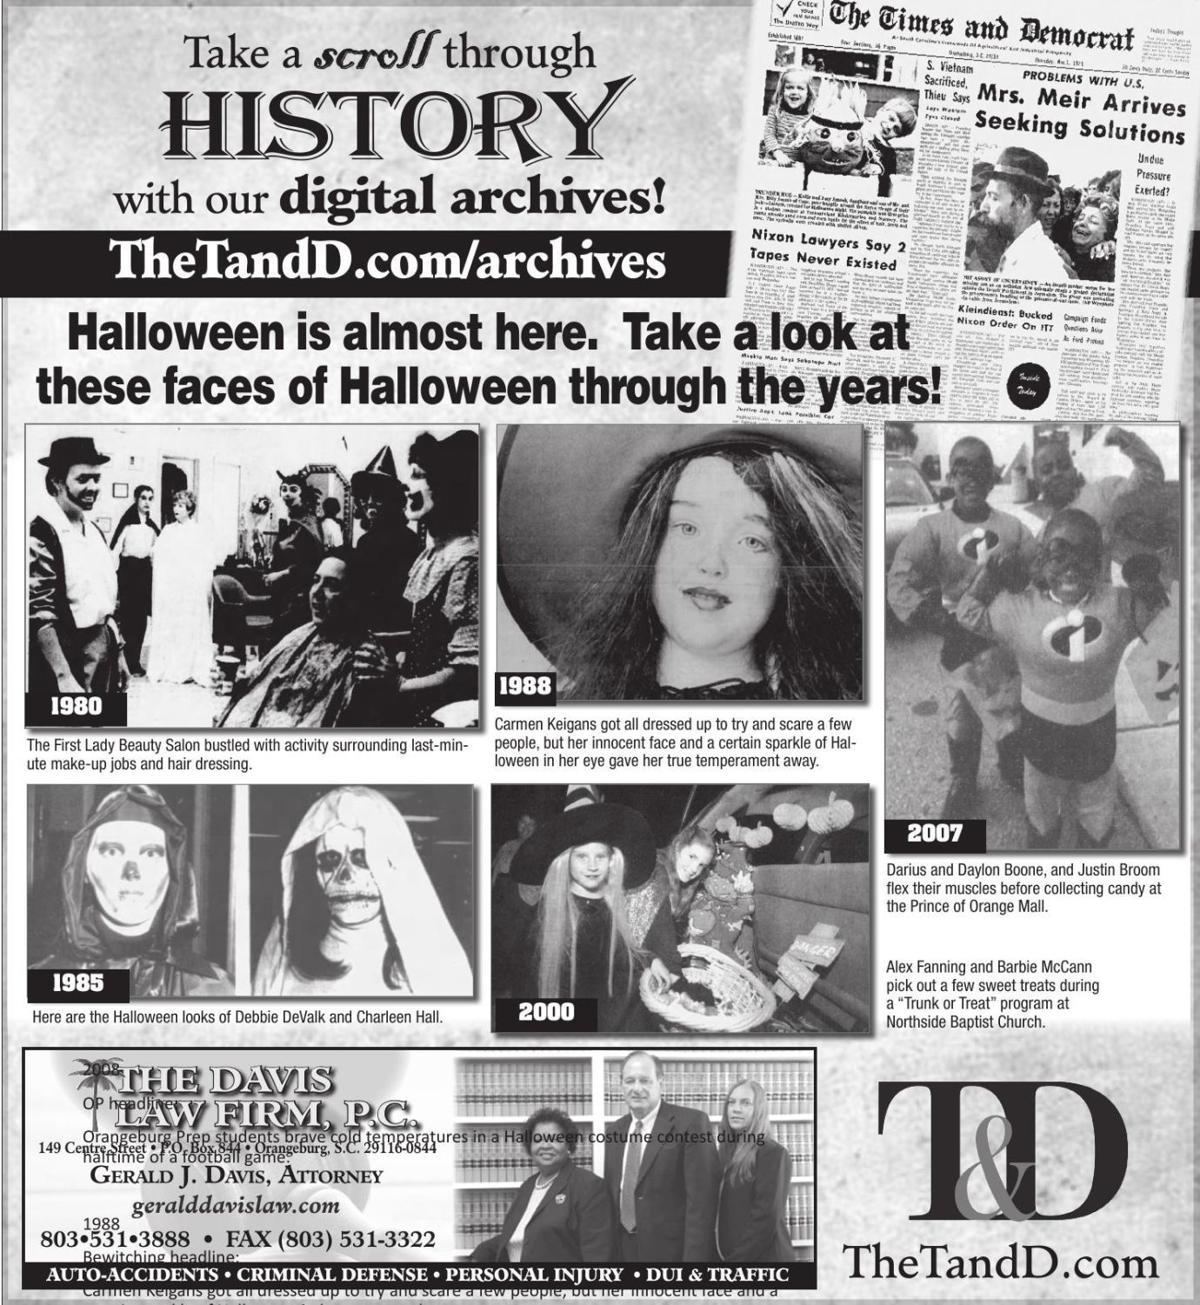 TheTandD.com/archives Oct. 27, 2019